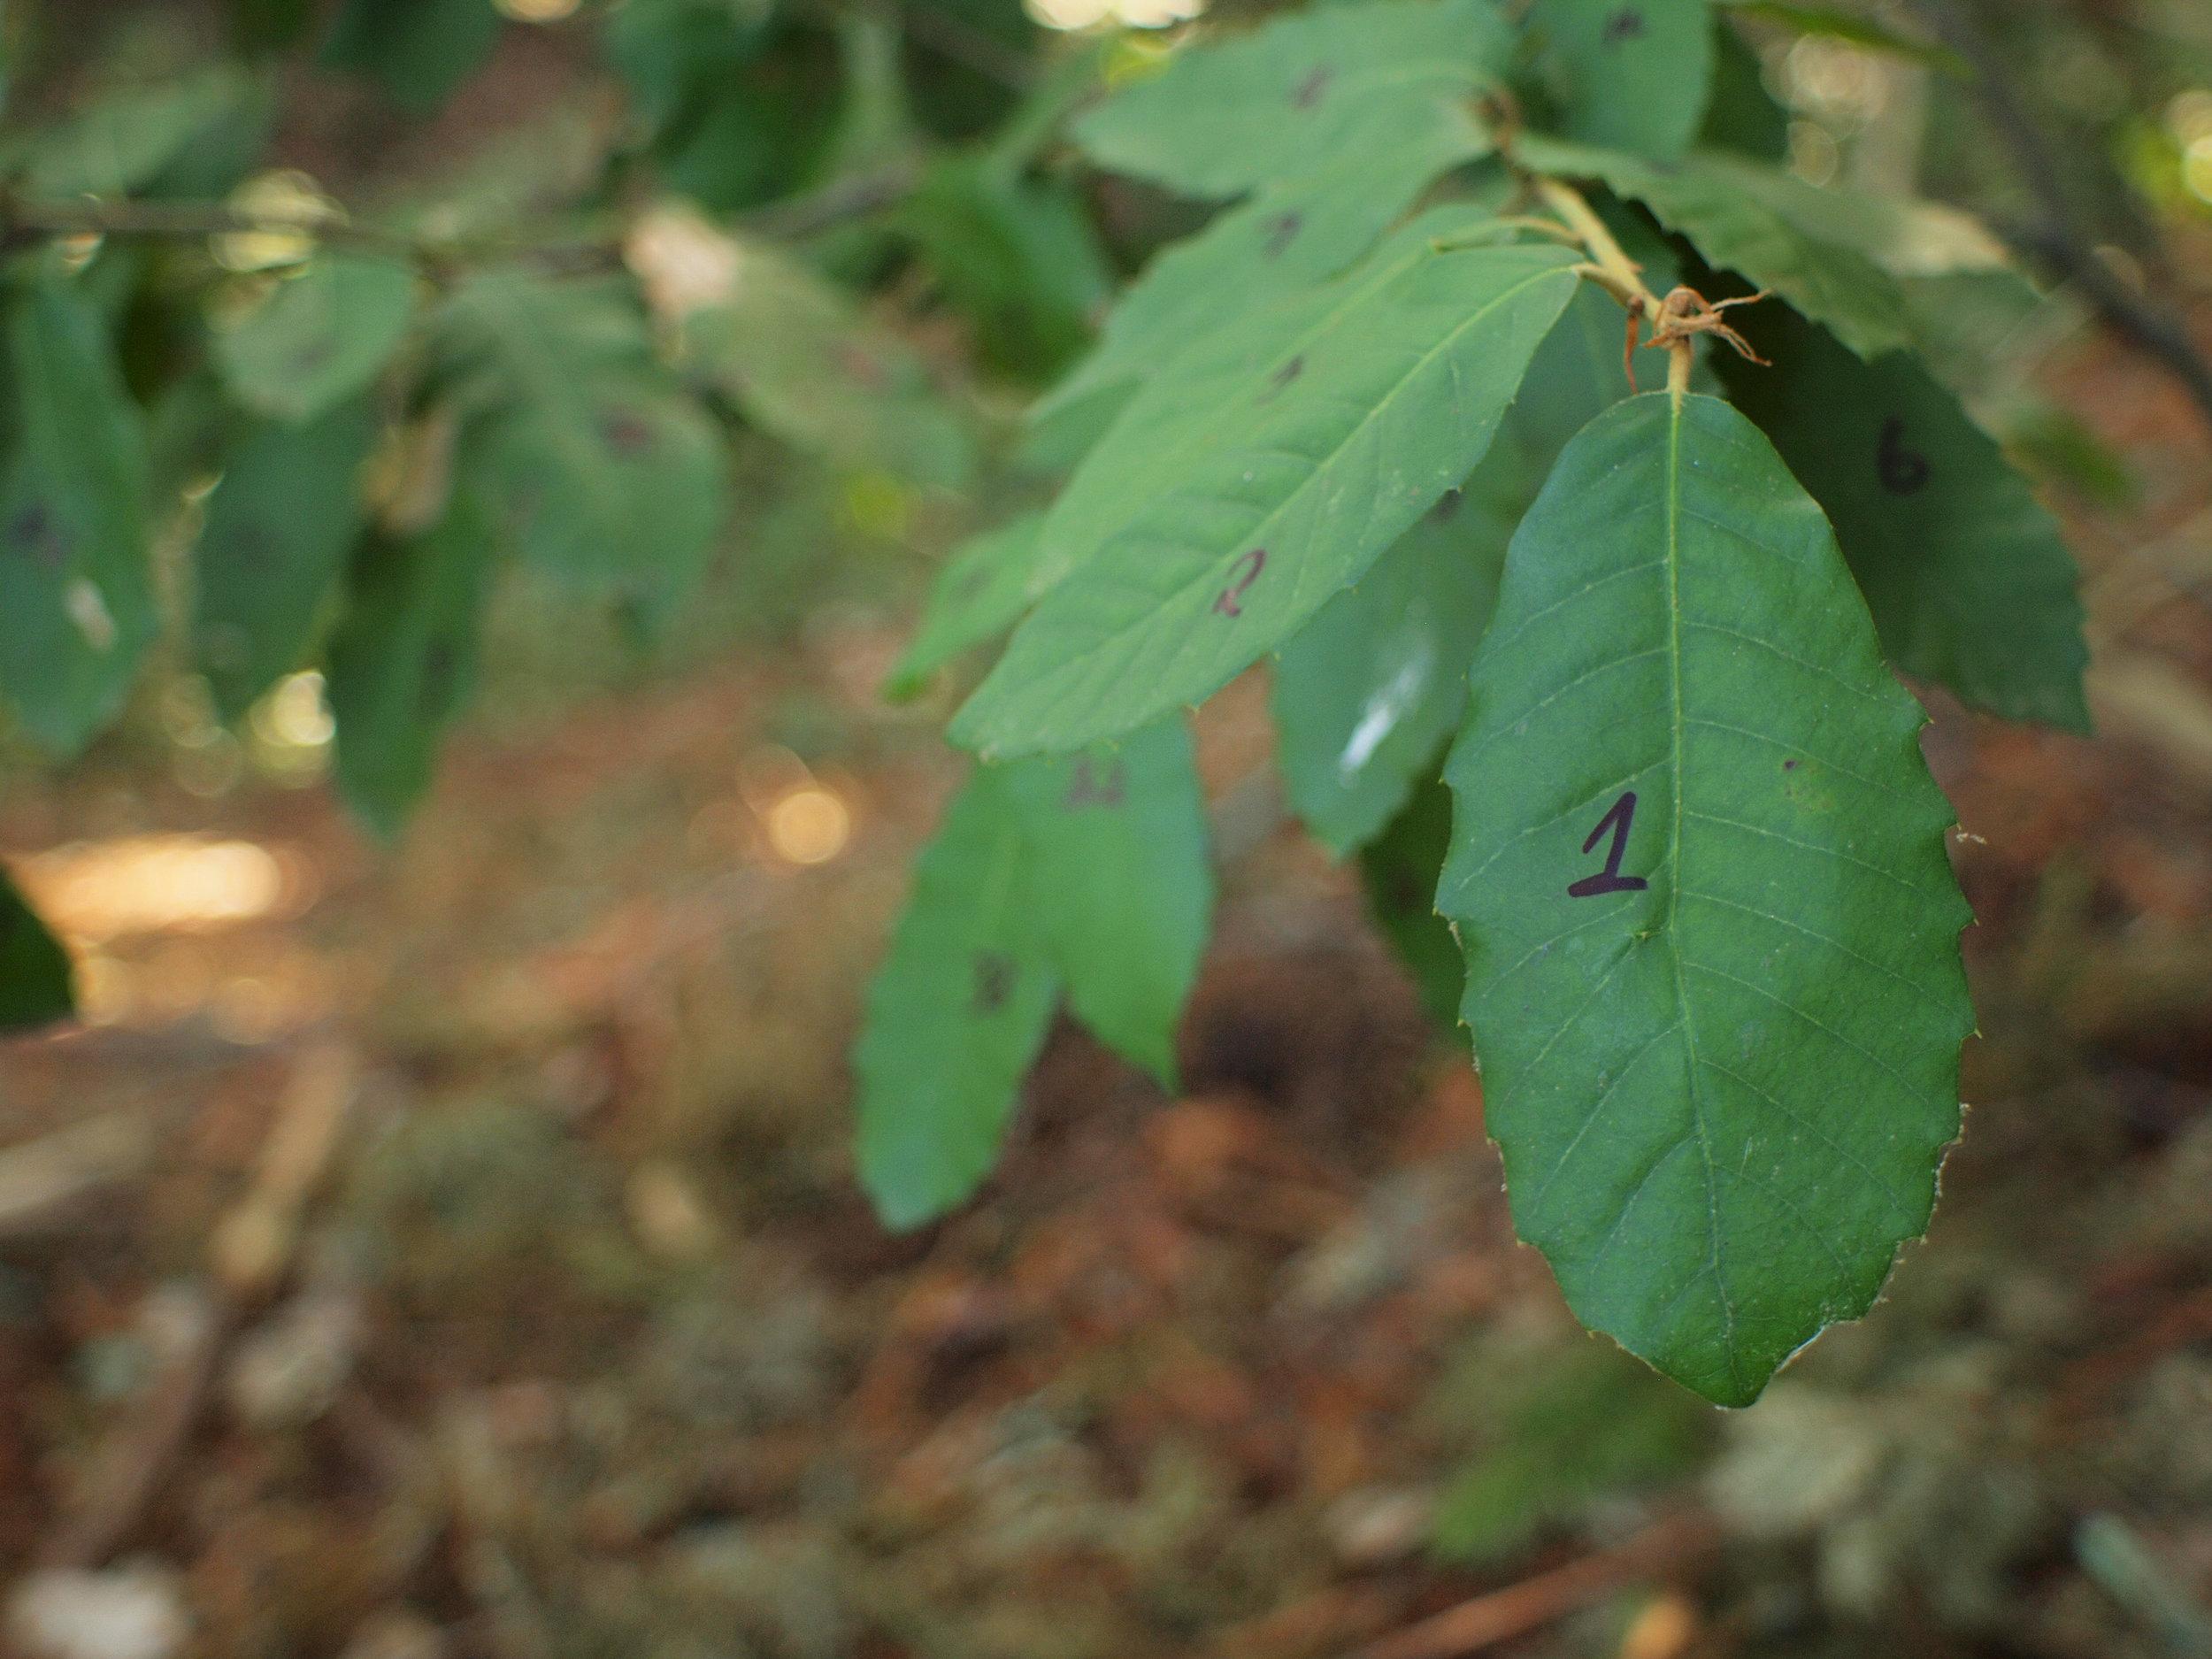 DonN, 412 Tan Oak leaves 18, 021412.jpg